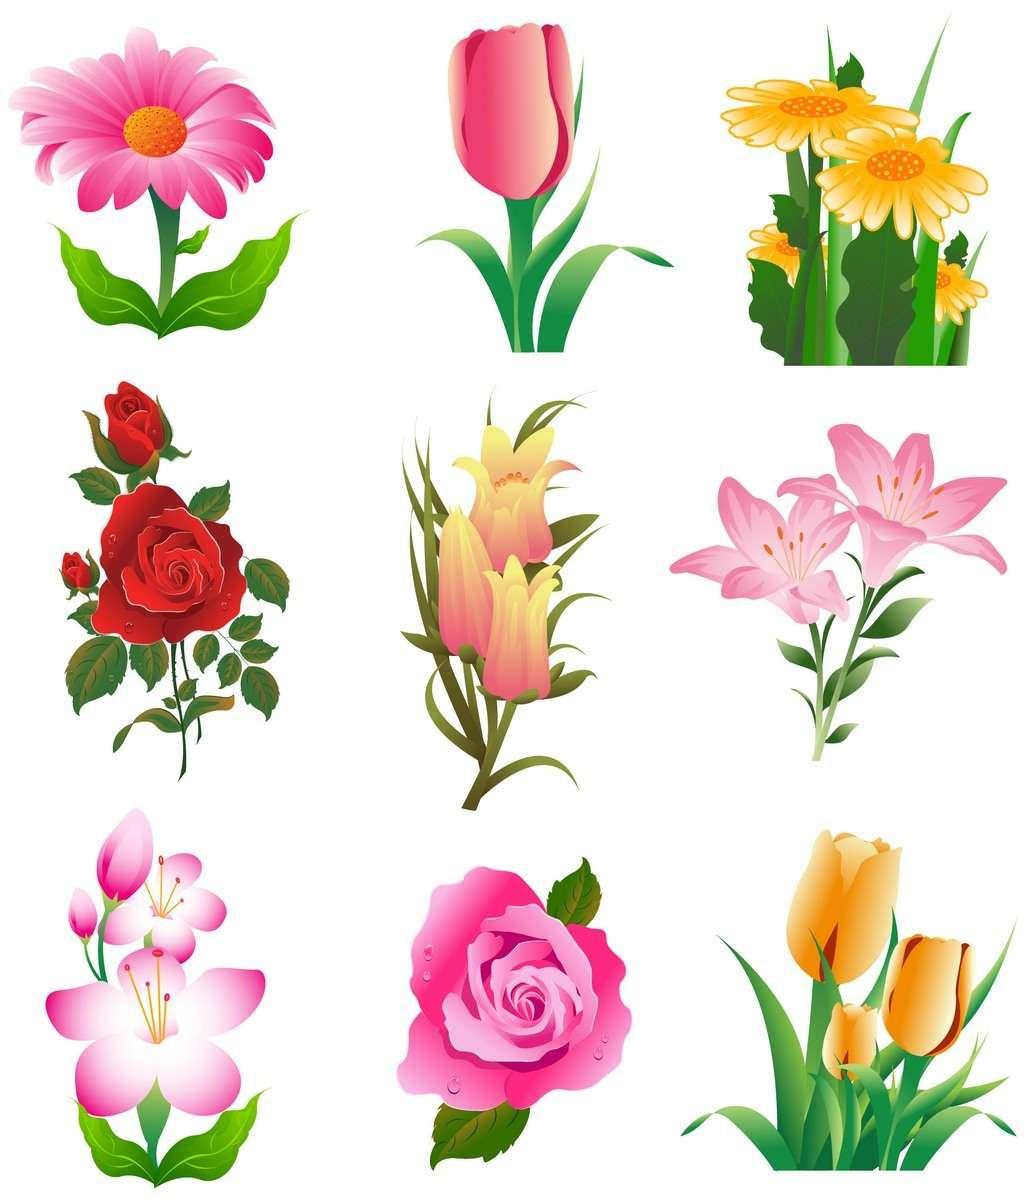 Flower, Rose, Tulip png